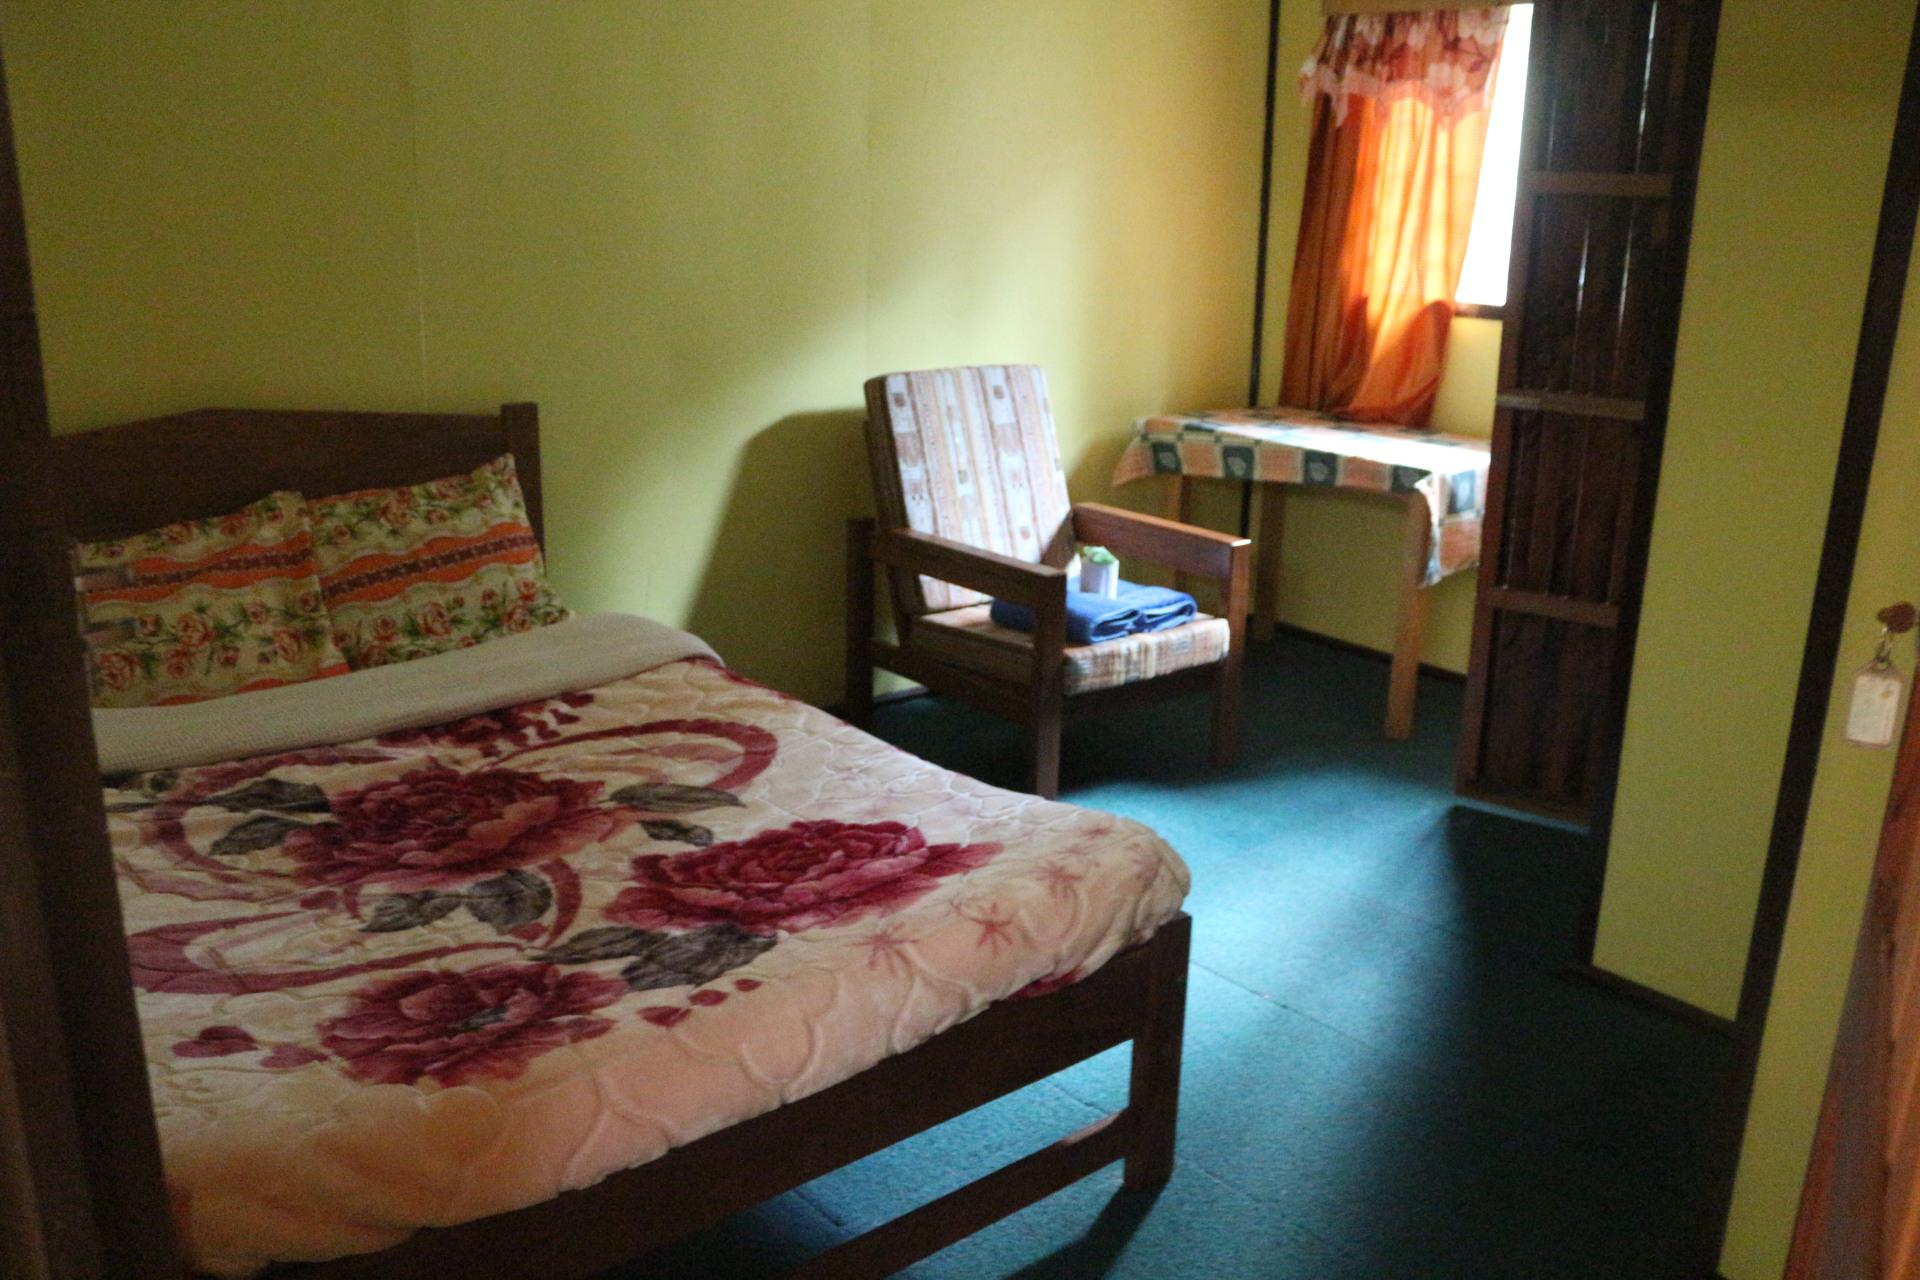 Accommodation at Mt Wilhelm, Camp JJ;  Mt Wilhelm; PNG Tourism; Mount Wilhelm; Climbing; Trekking; PNG; Papua New Guinea